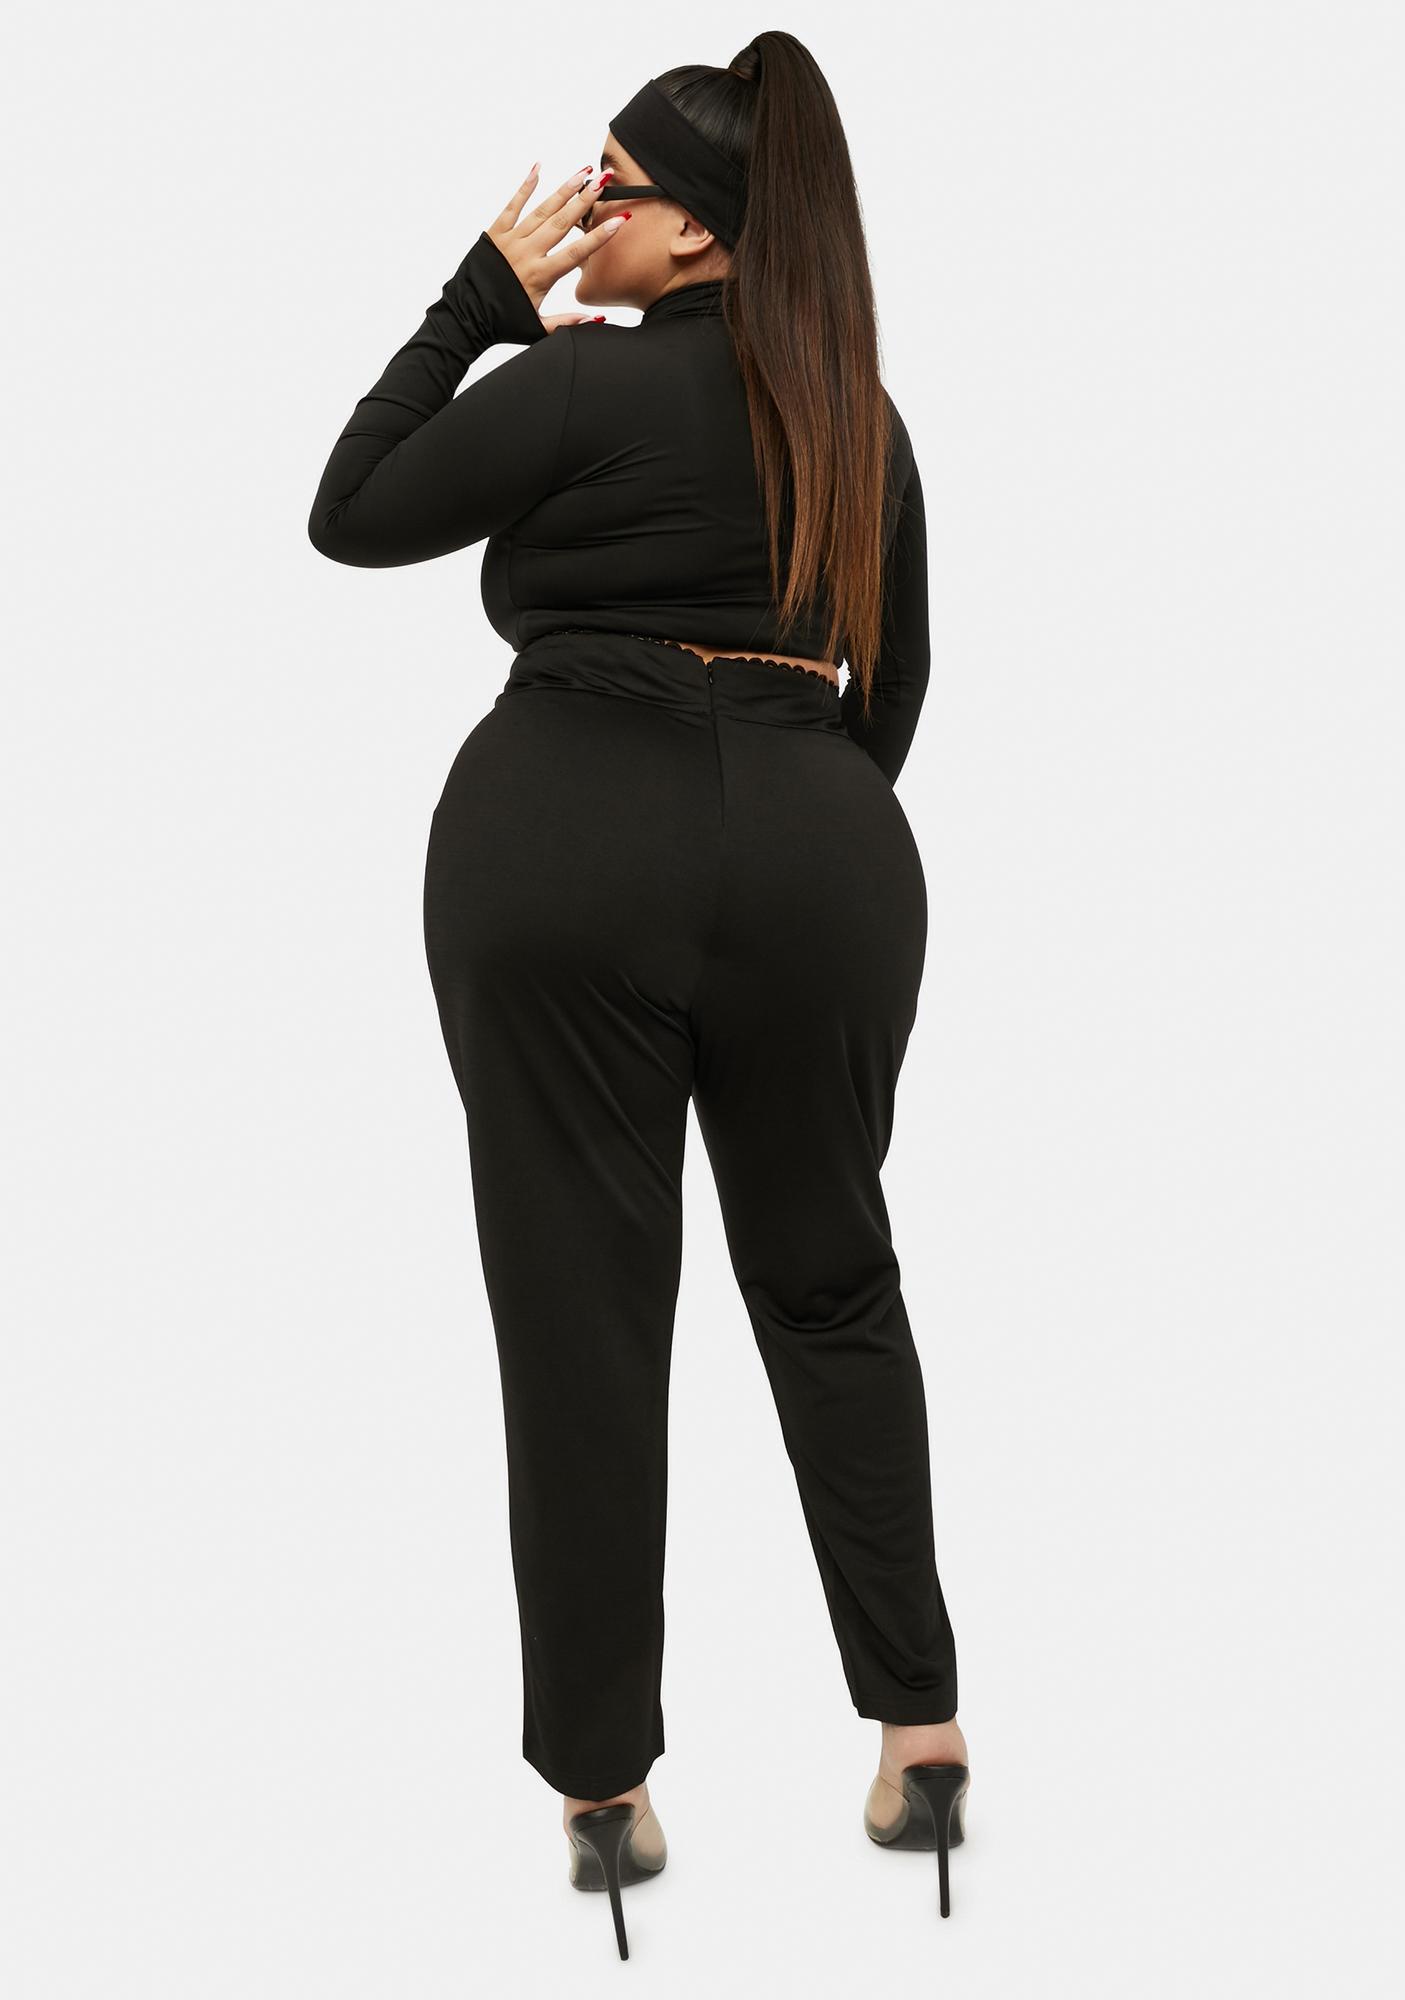 Honey I Wanna Know Lace Up Pants